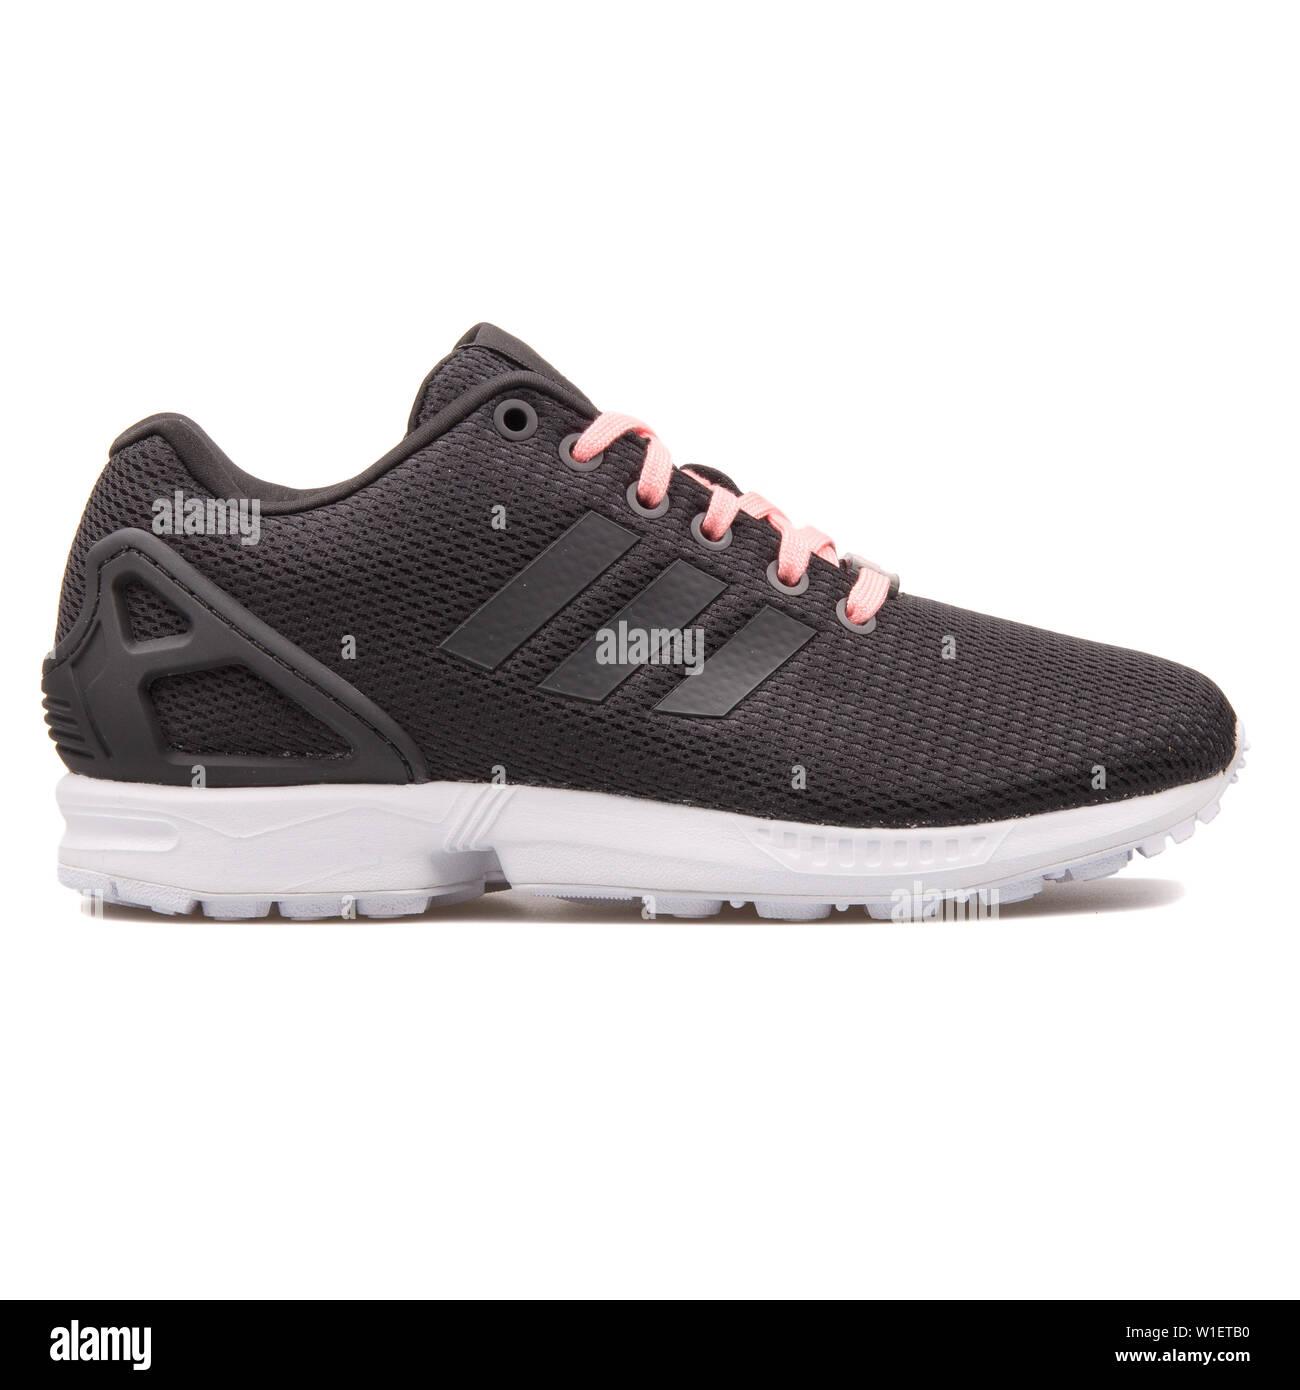 finest selection 79695 ce898 VIENNA, AUSTRIA - AUGUST 10, 2017: Adidas ZX Flux black ...